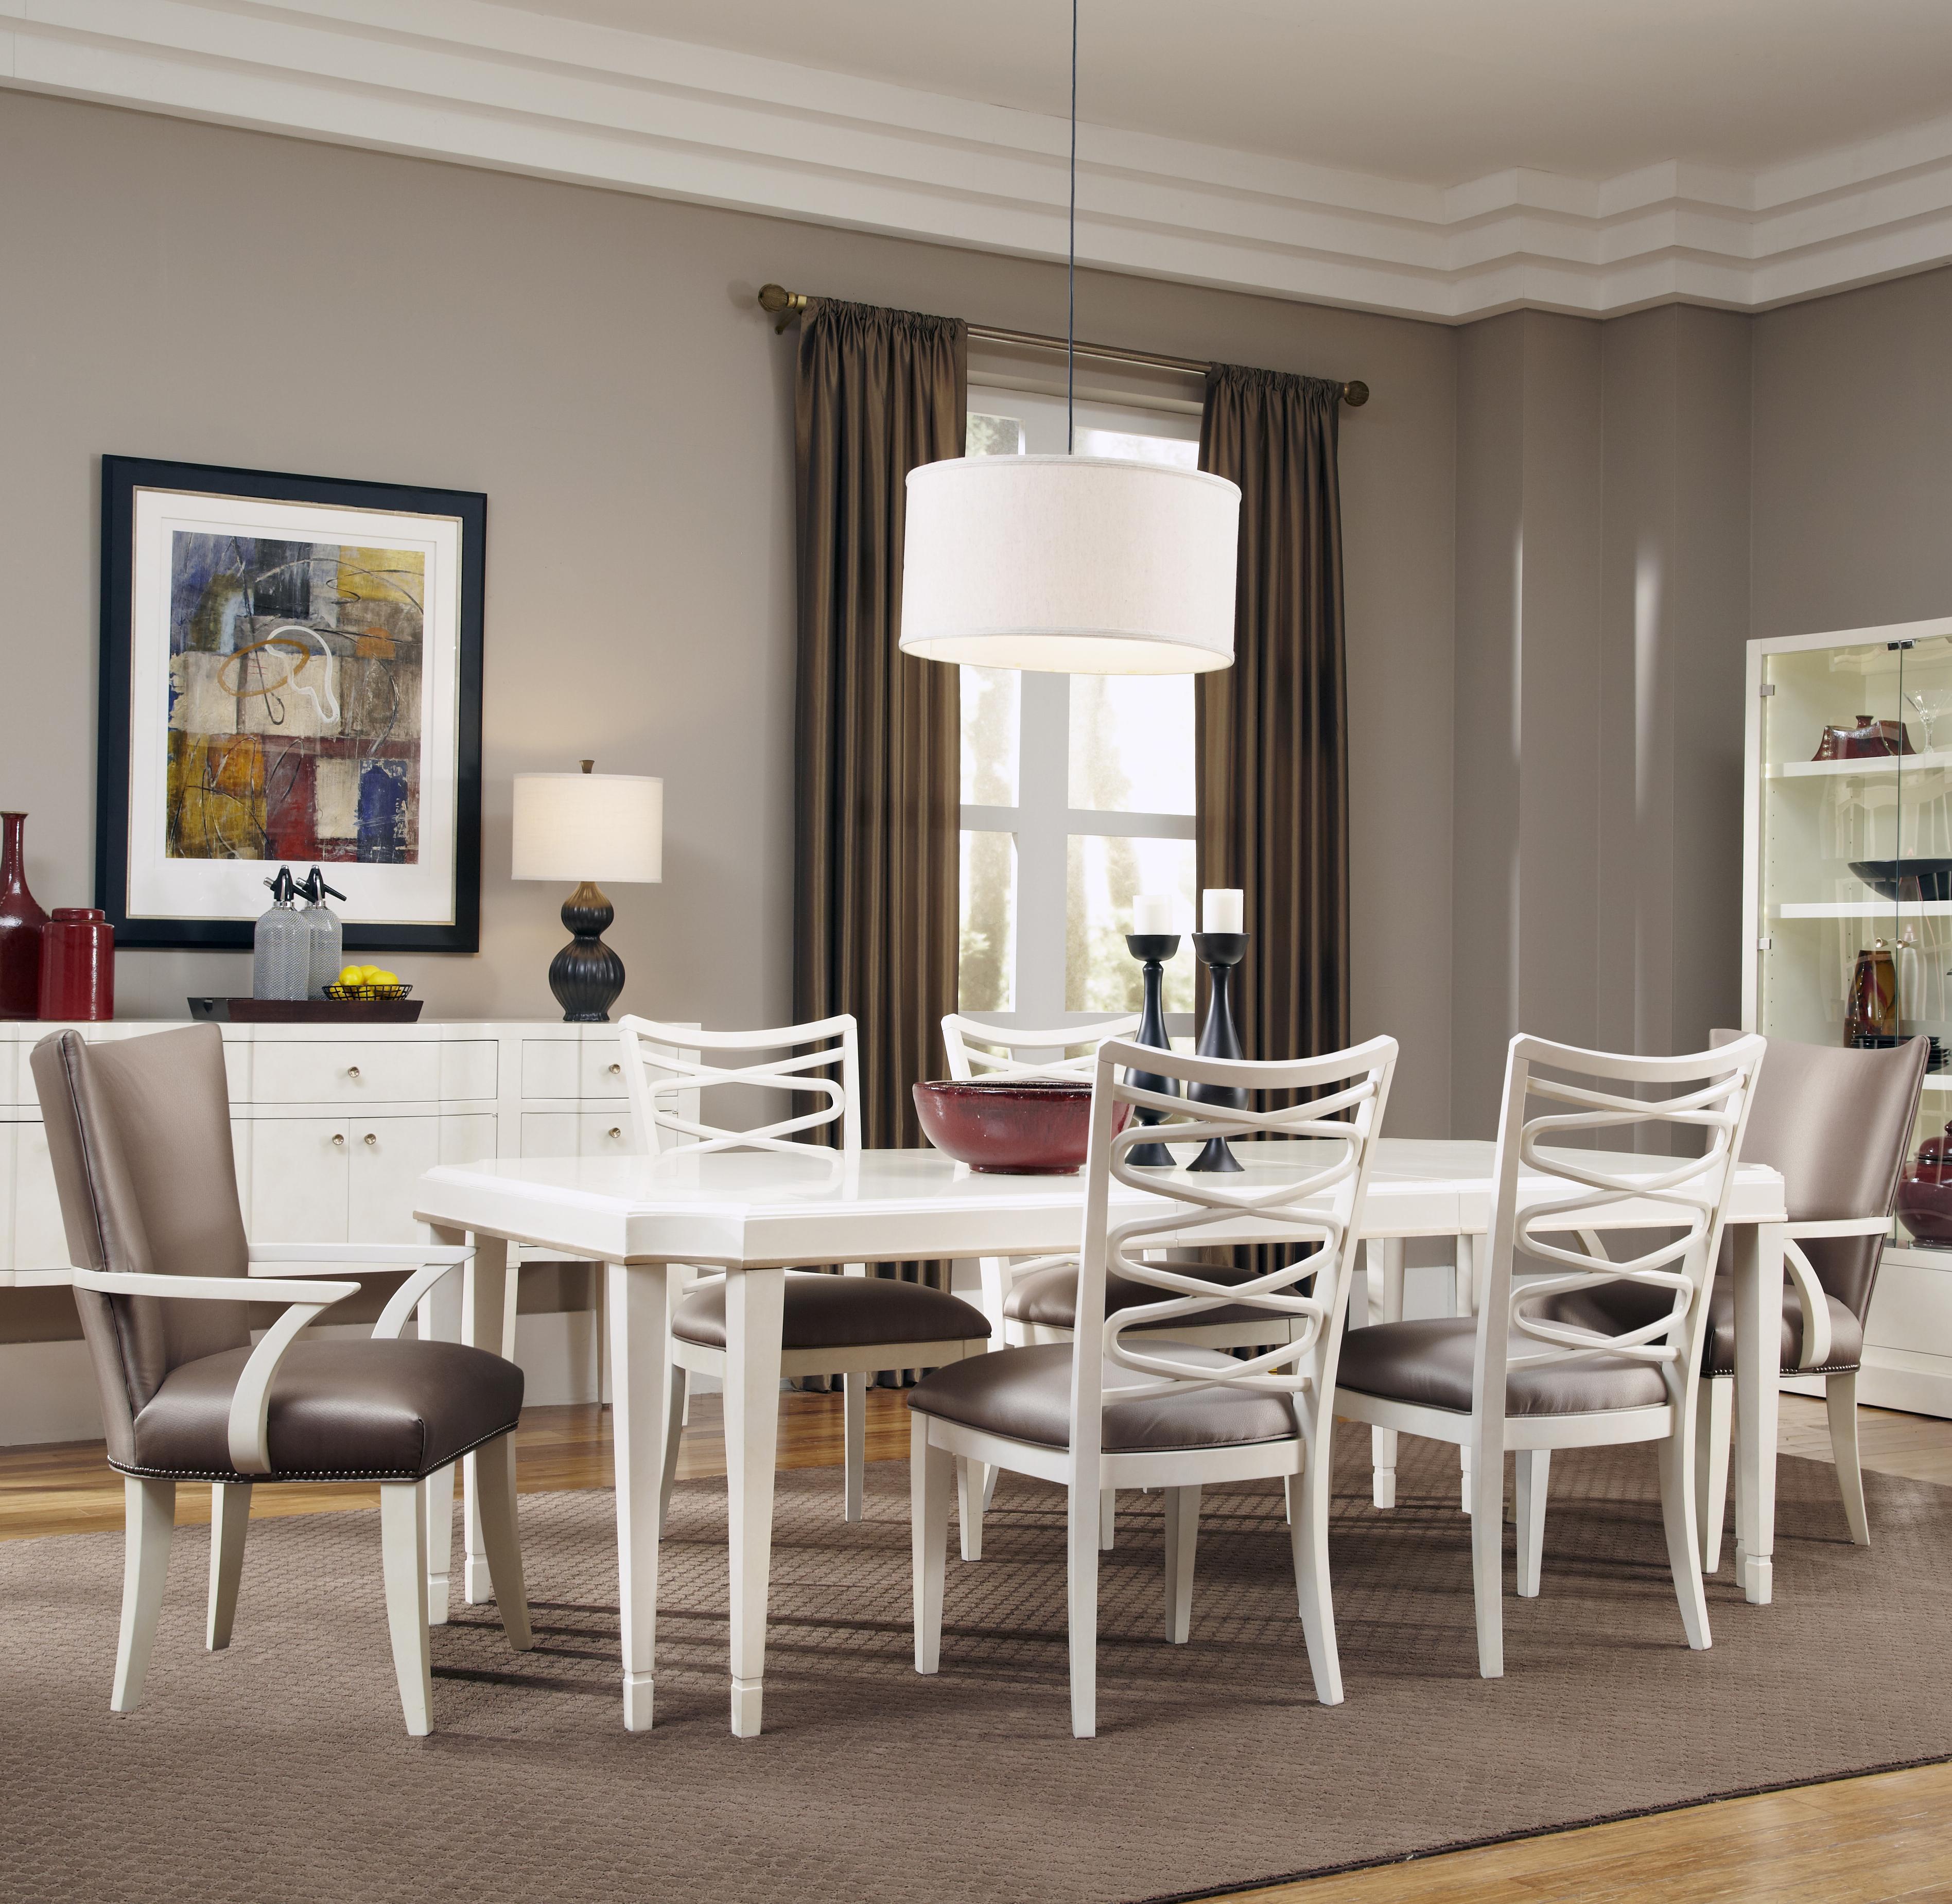 Belfort Signature Magellan 7-Piece Leg Dining Table Set - Item Number: 208220-1817+2x208207+4x208204